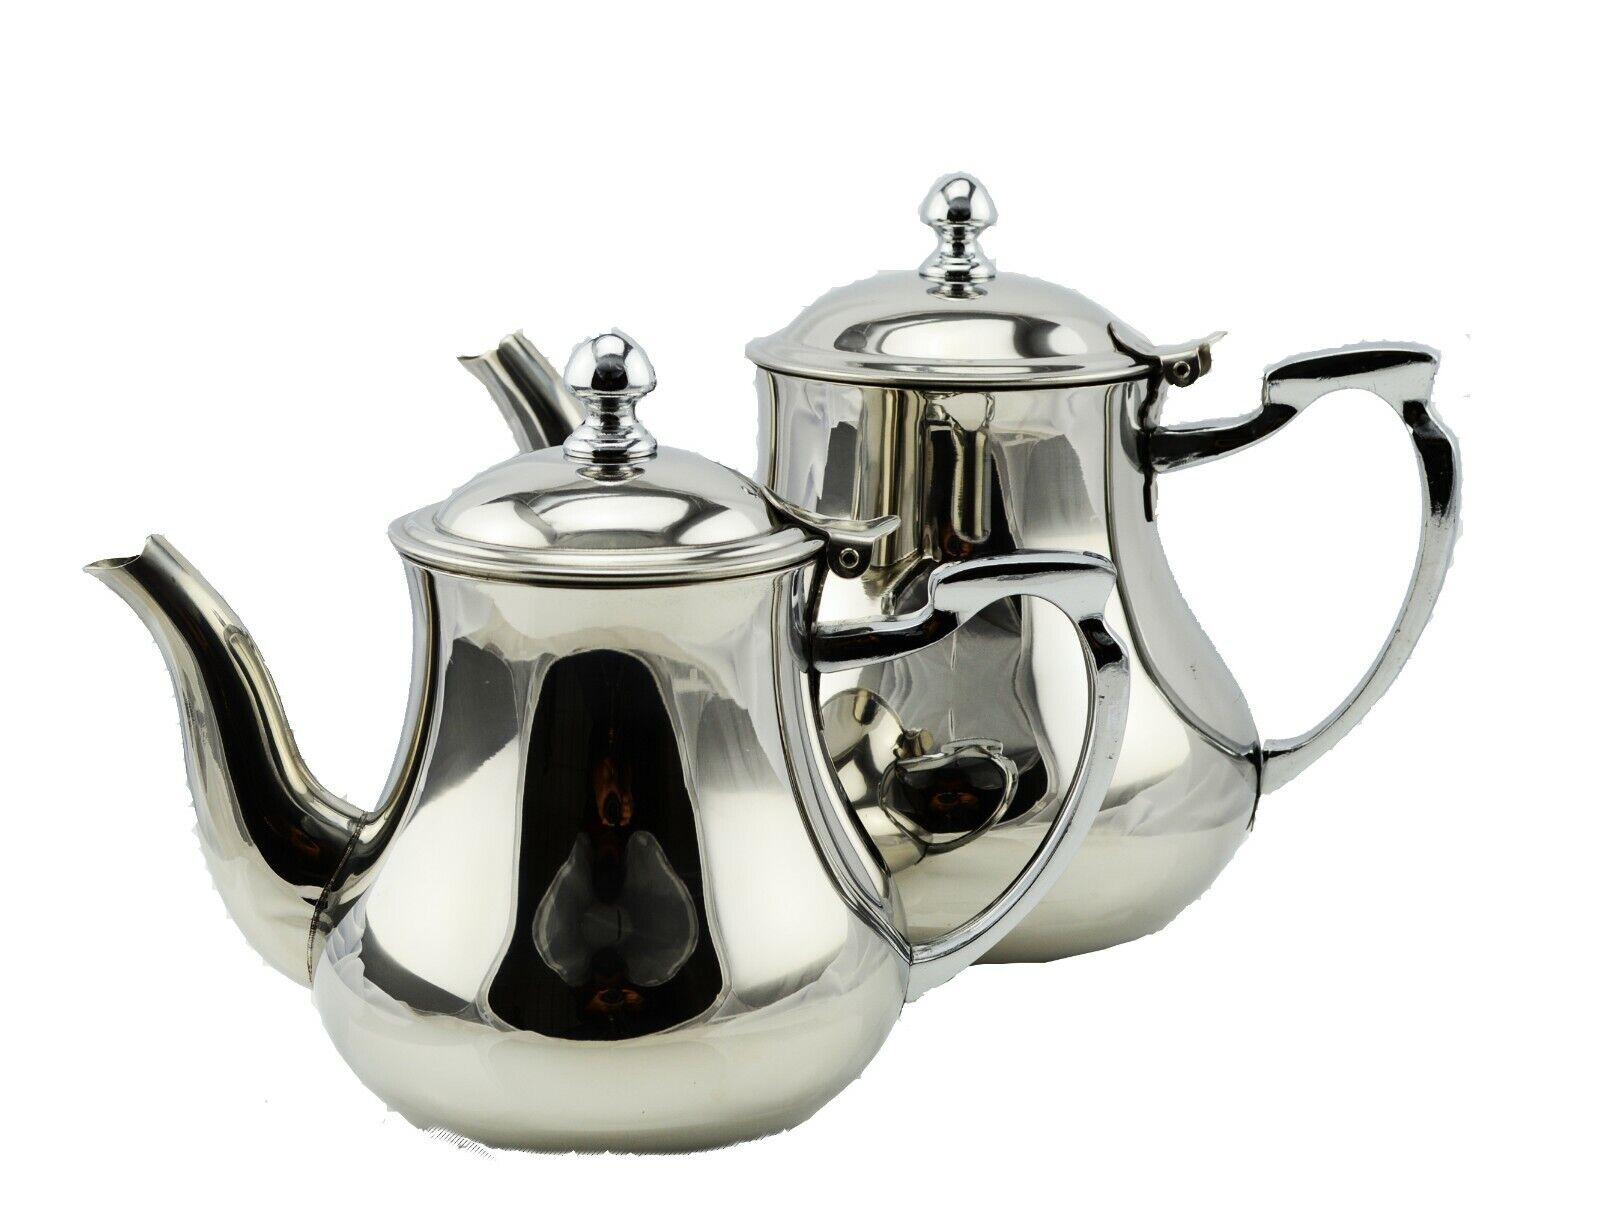 Teekanne Kaffeekanne Edelstahl Marokkanisch Orientalisch Induktion geeignet